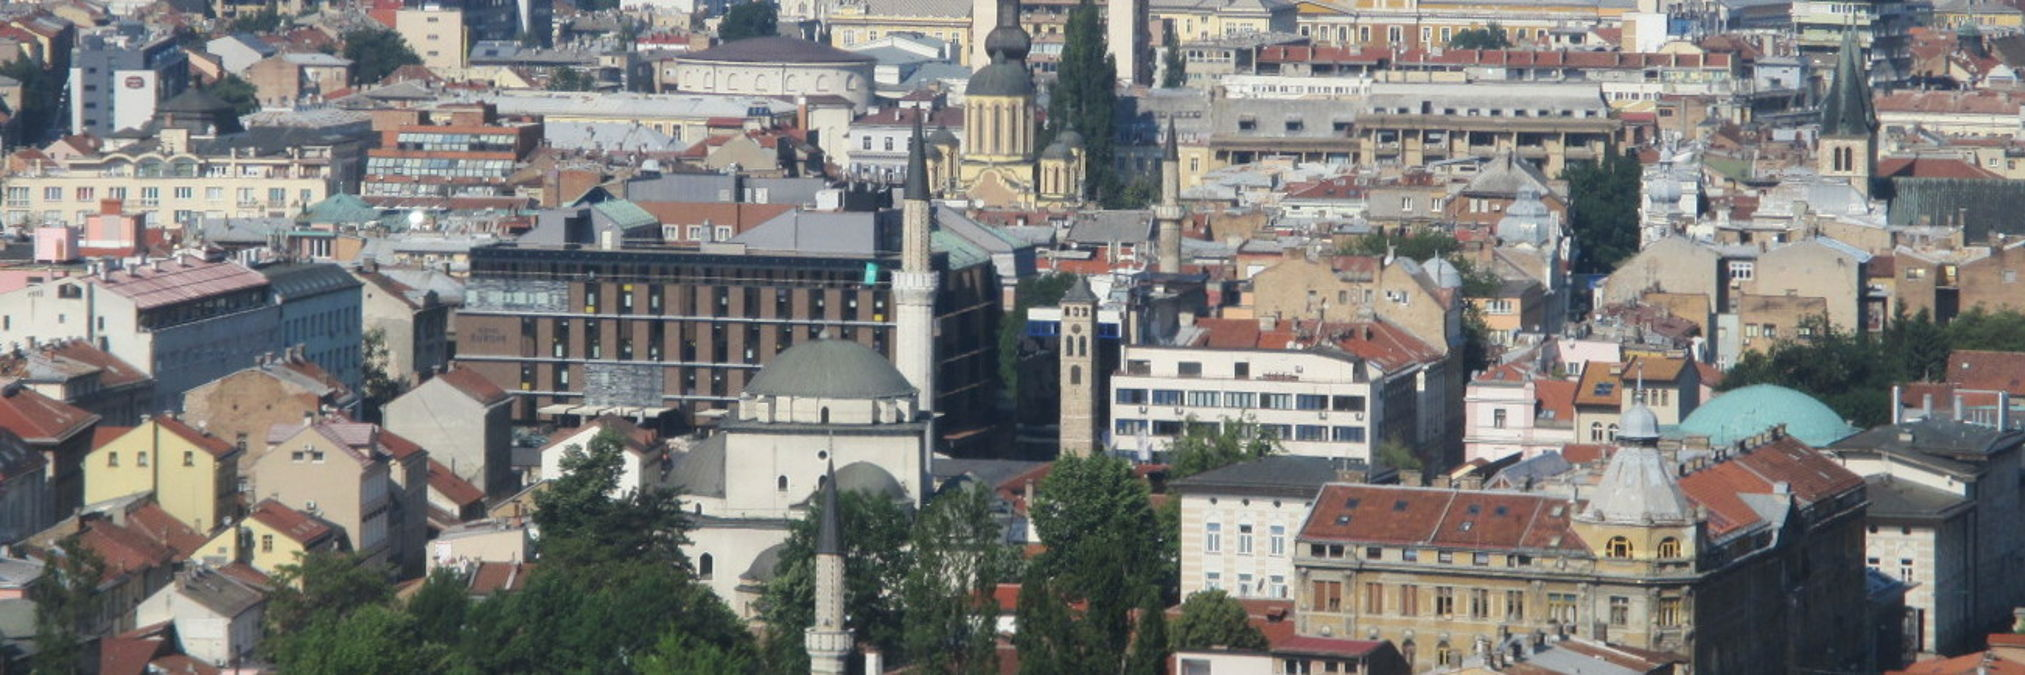 Религии в Боснии и Герцеговине. Фото: Елена Арсениевич, CC BY-SA 3.0